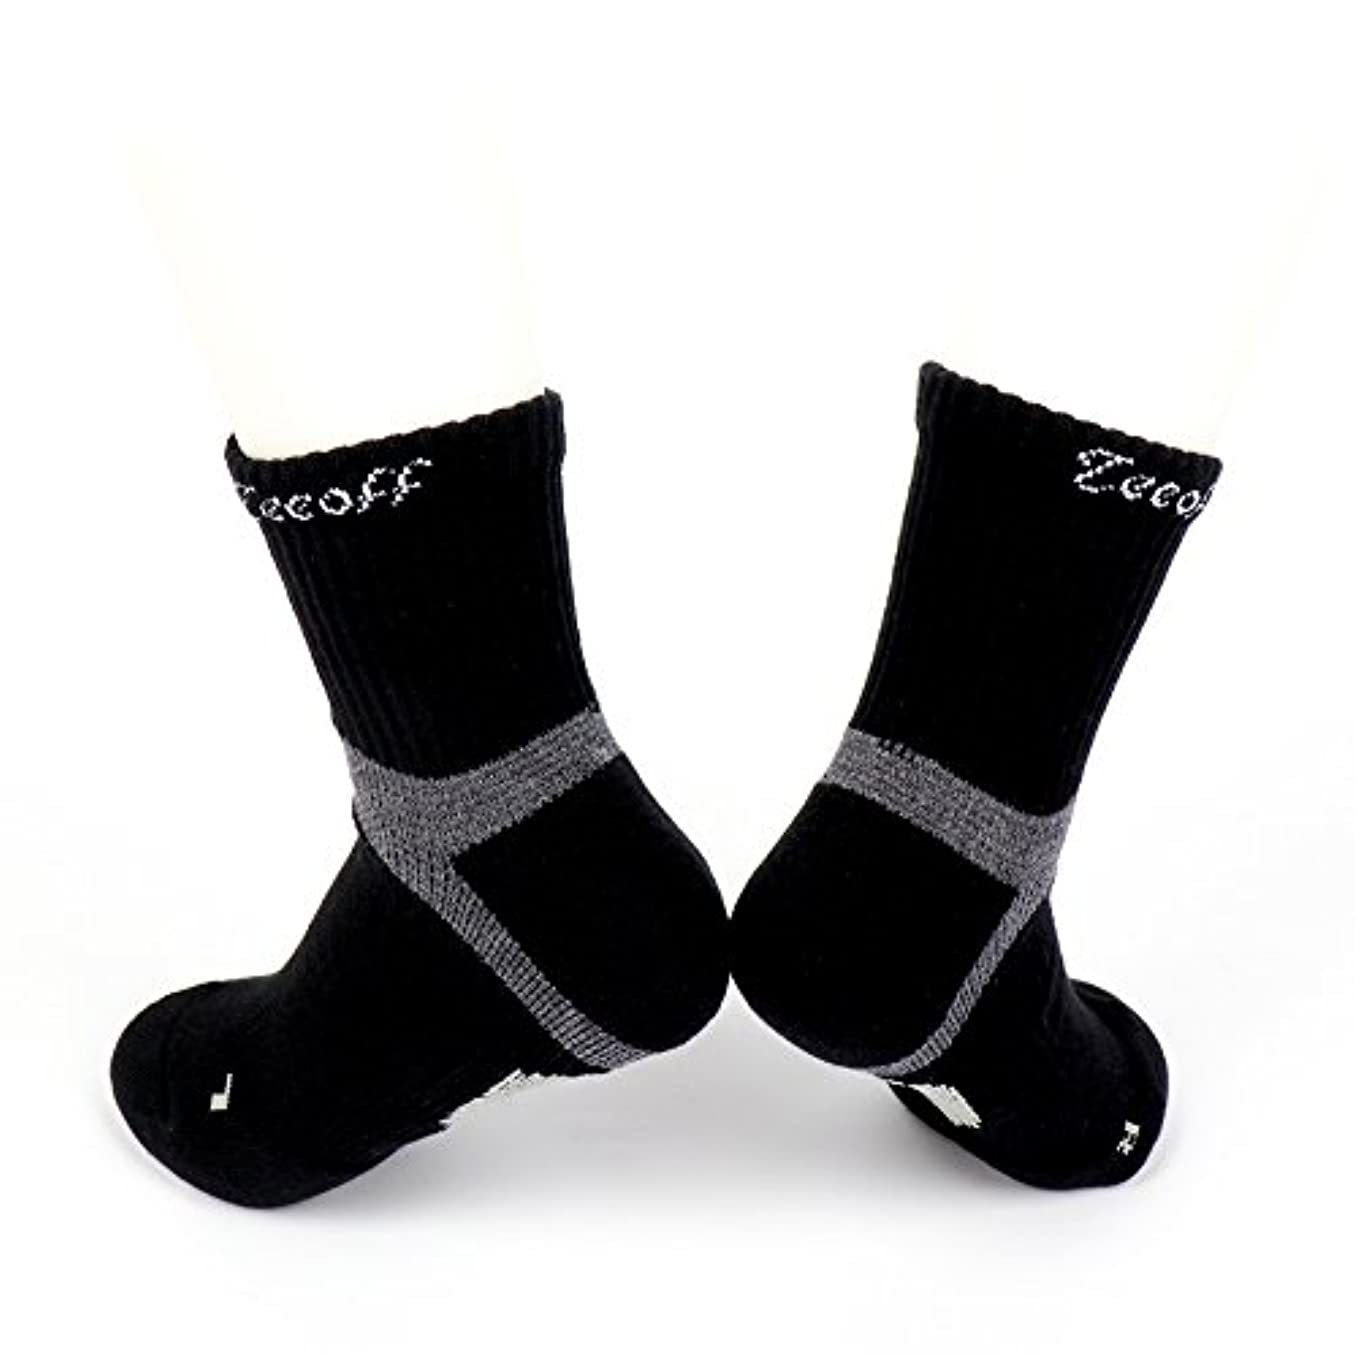 Teeoff Men's LYCRA Sport Sock メンズライクラクッションショックアブソーバー、通気性、アーチ&アンクルサポートスポーツソックス強化